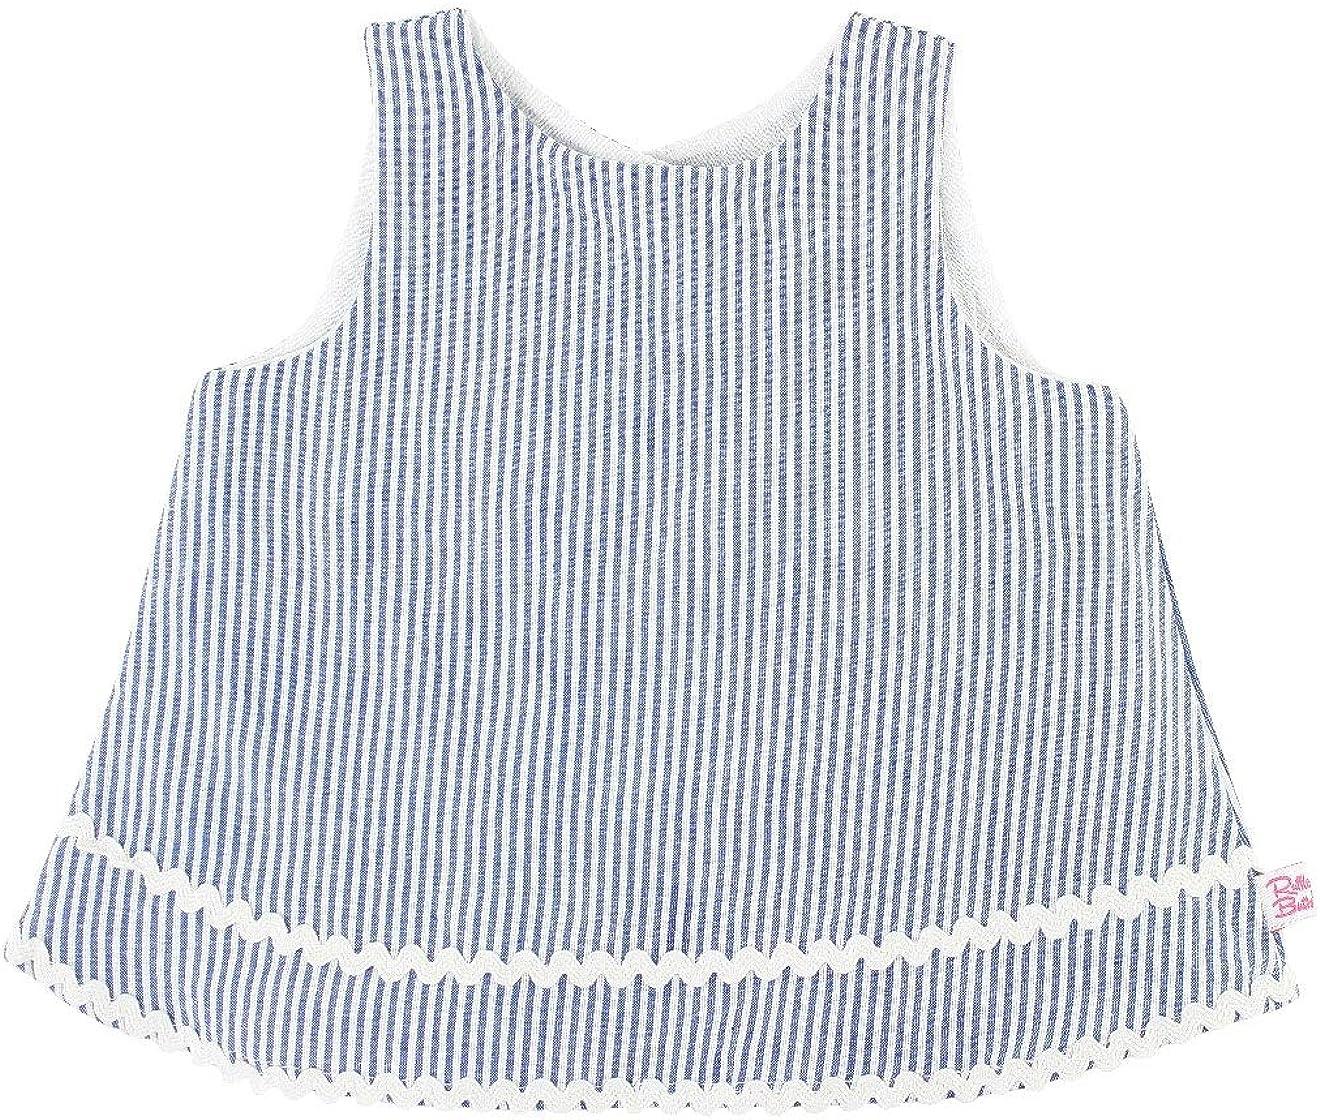 RuffleButts Baby/Toddler Girls Striped Seersucker Open Back Swing Top Tank